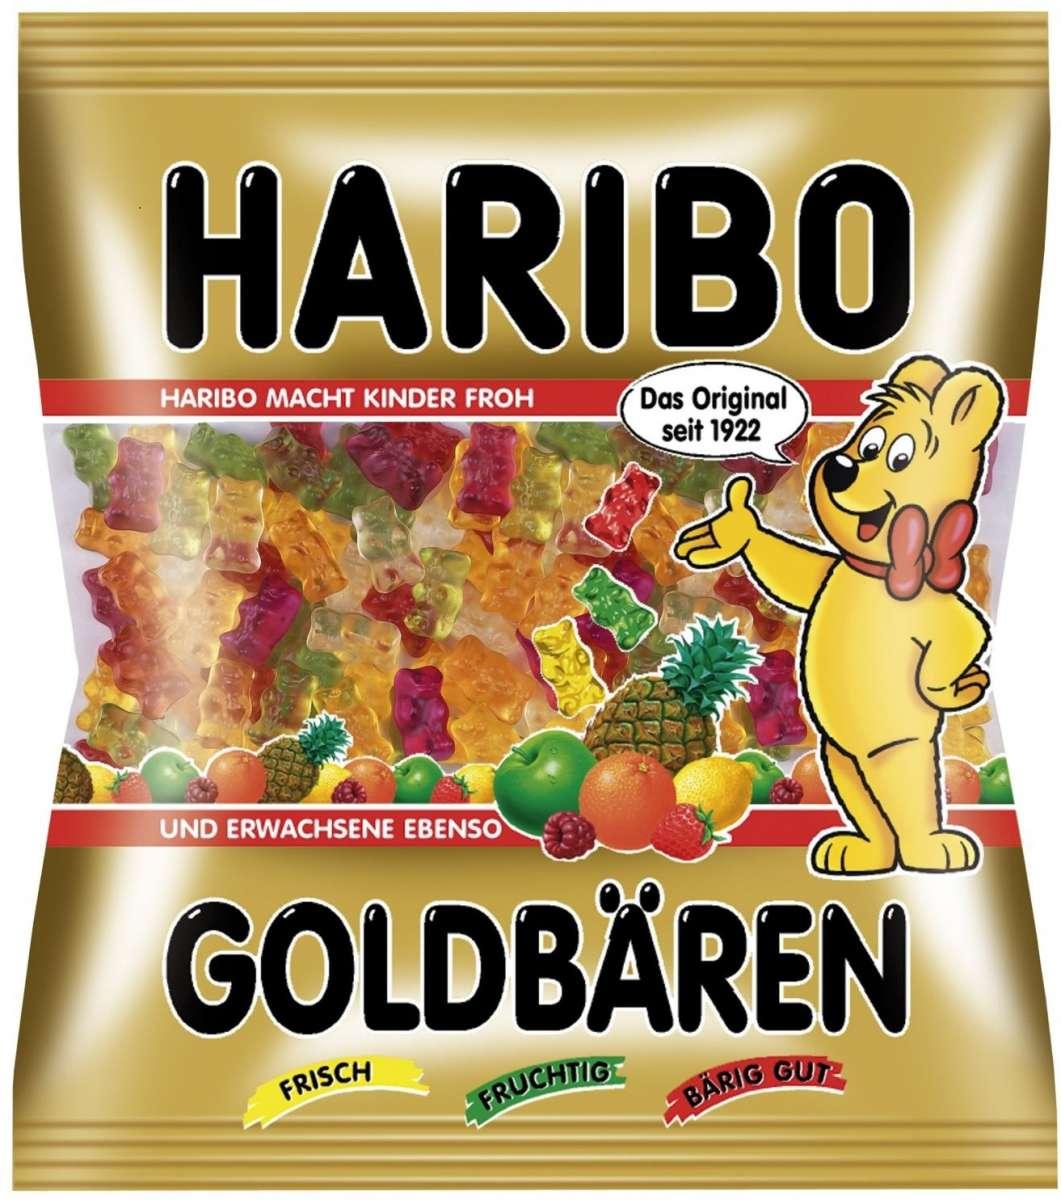 haribo gold baren